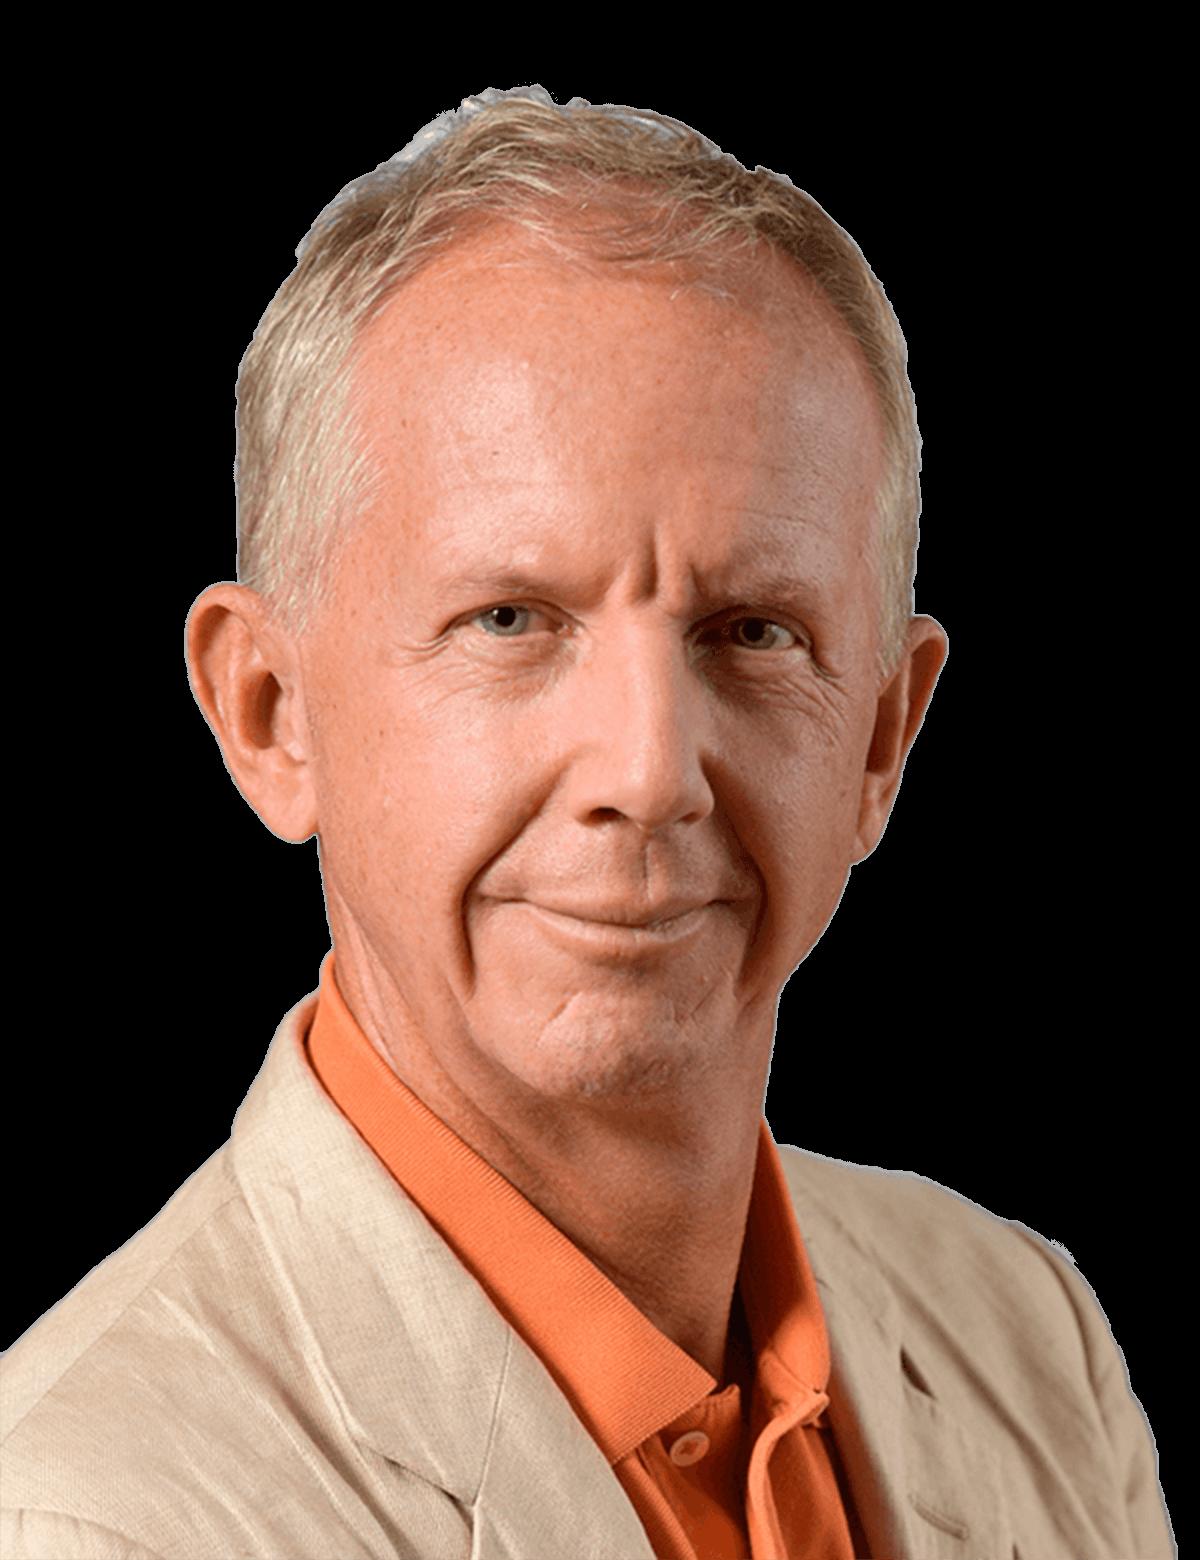 Dr. Per-Henrik Agren